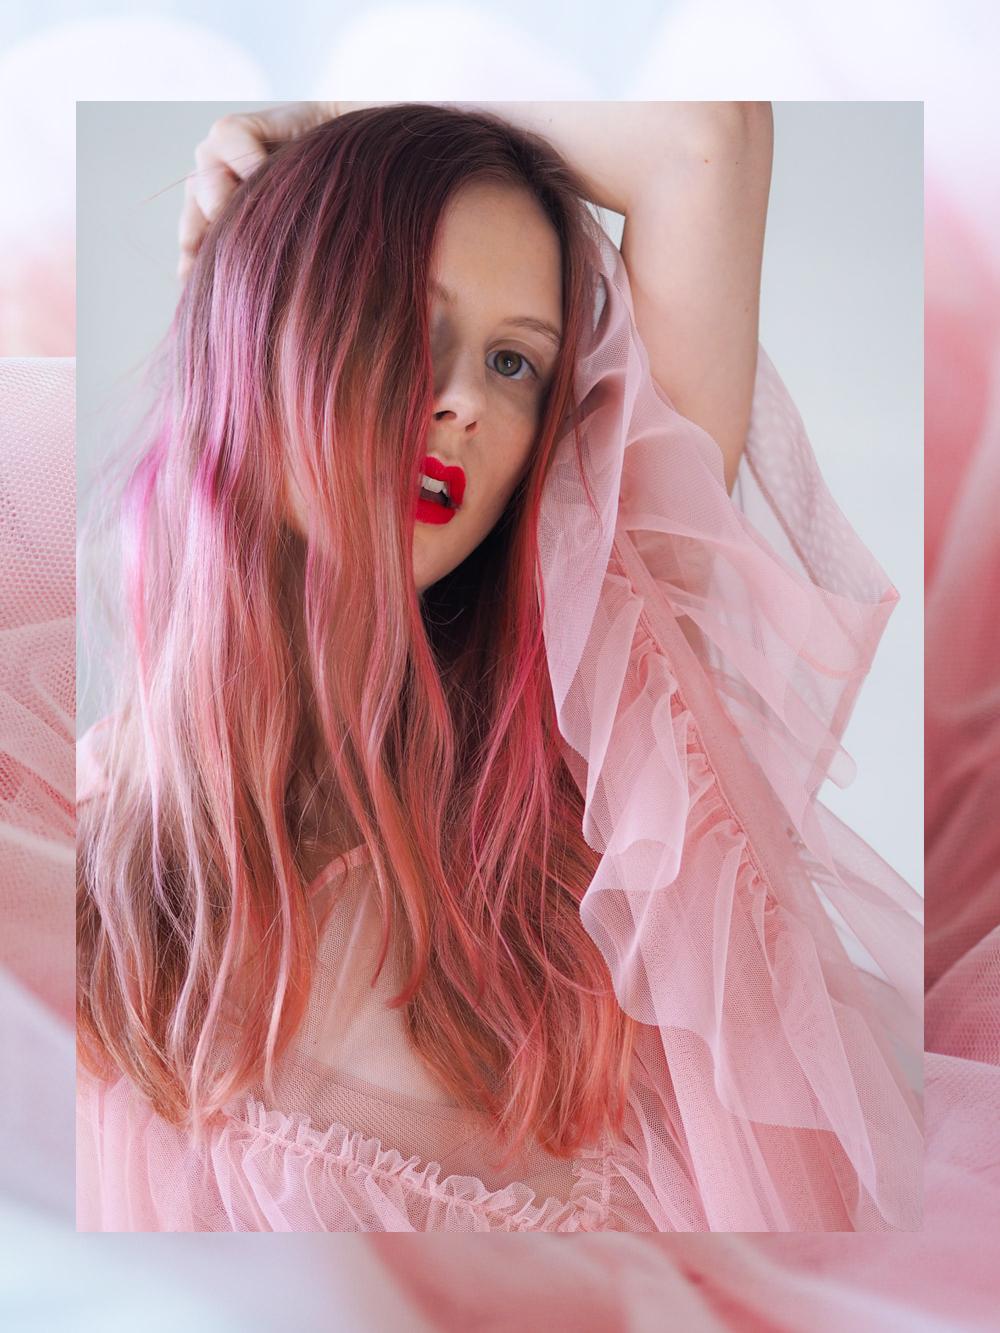 pink-hair-nemesis-babe-marie-my-blogger-maria-nila-pink-pop-13collage5.png